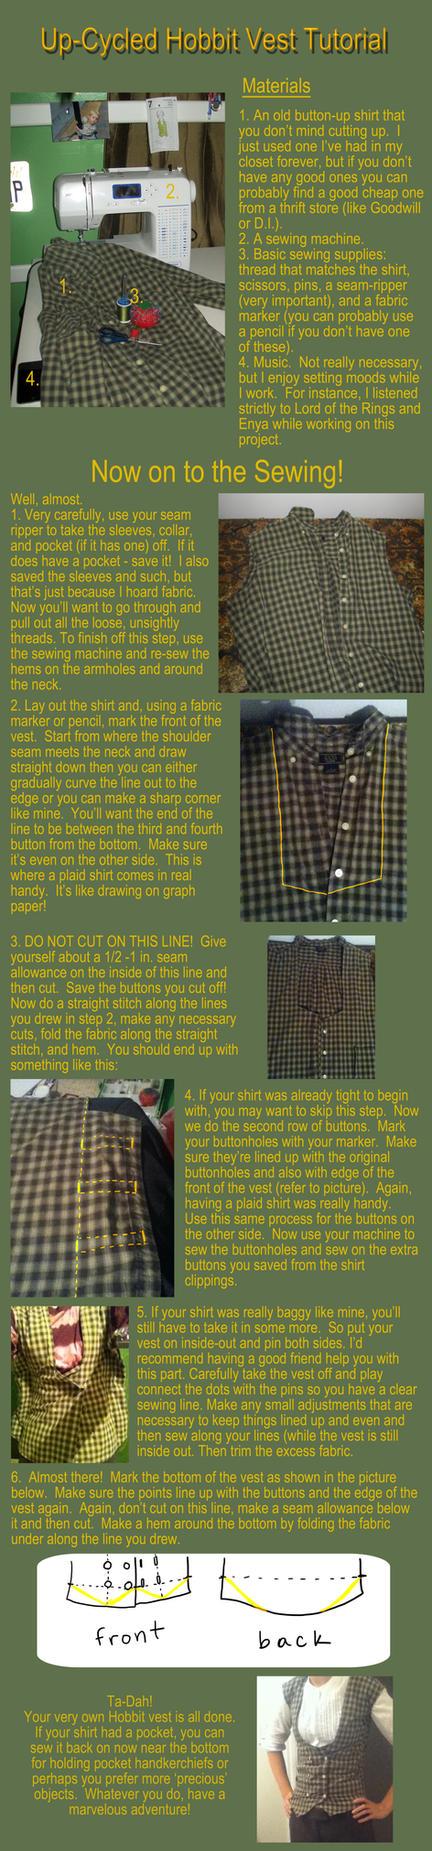 Up-Cycled Hobbit Vest Tutorial by Autnott